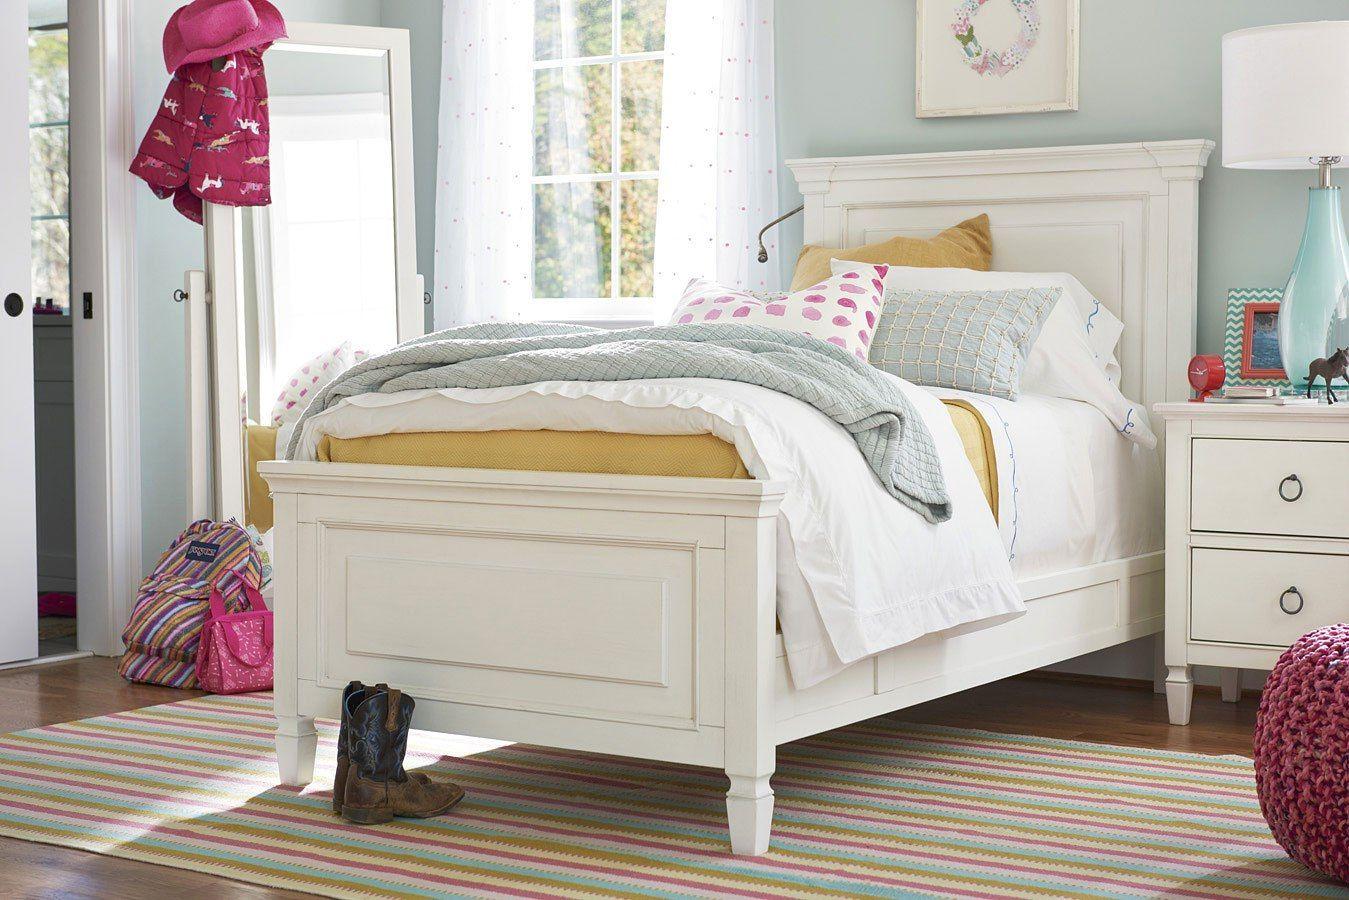 Summer Hill Reading Panel Bedroom Set in 2019 Bedroom